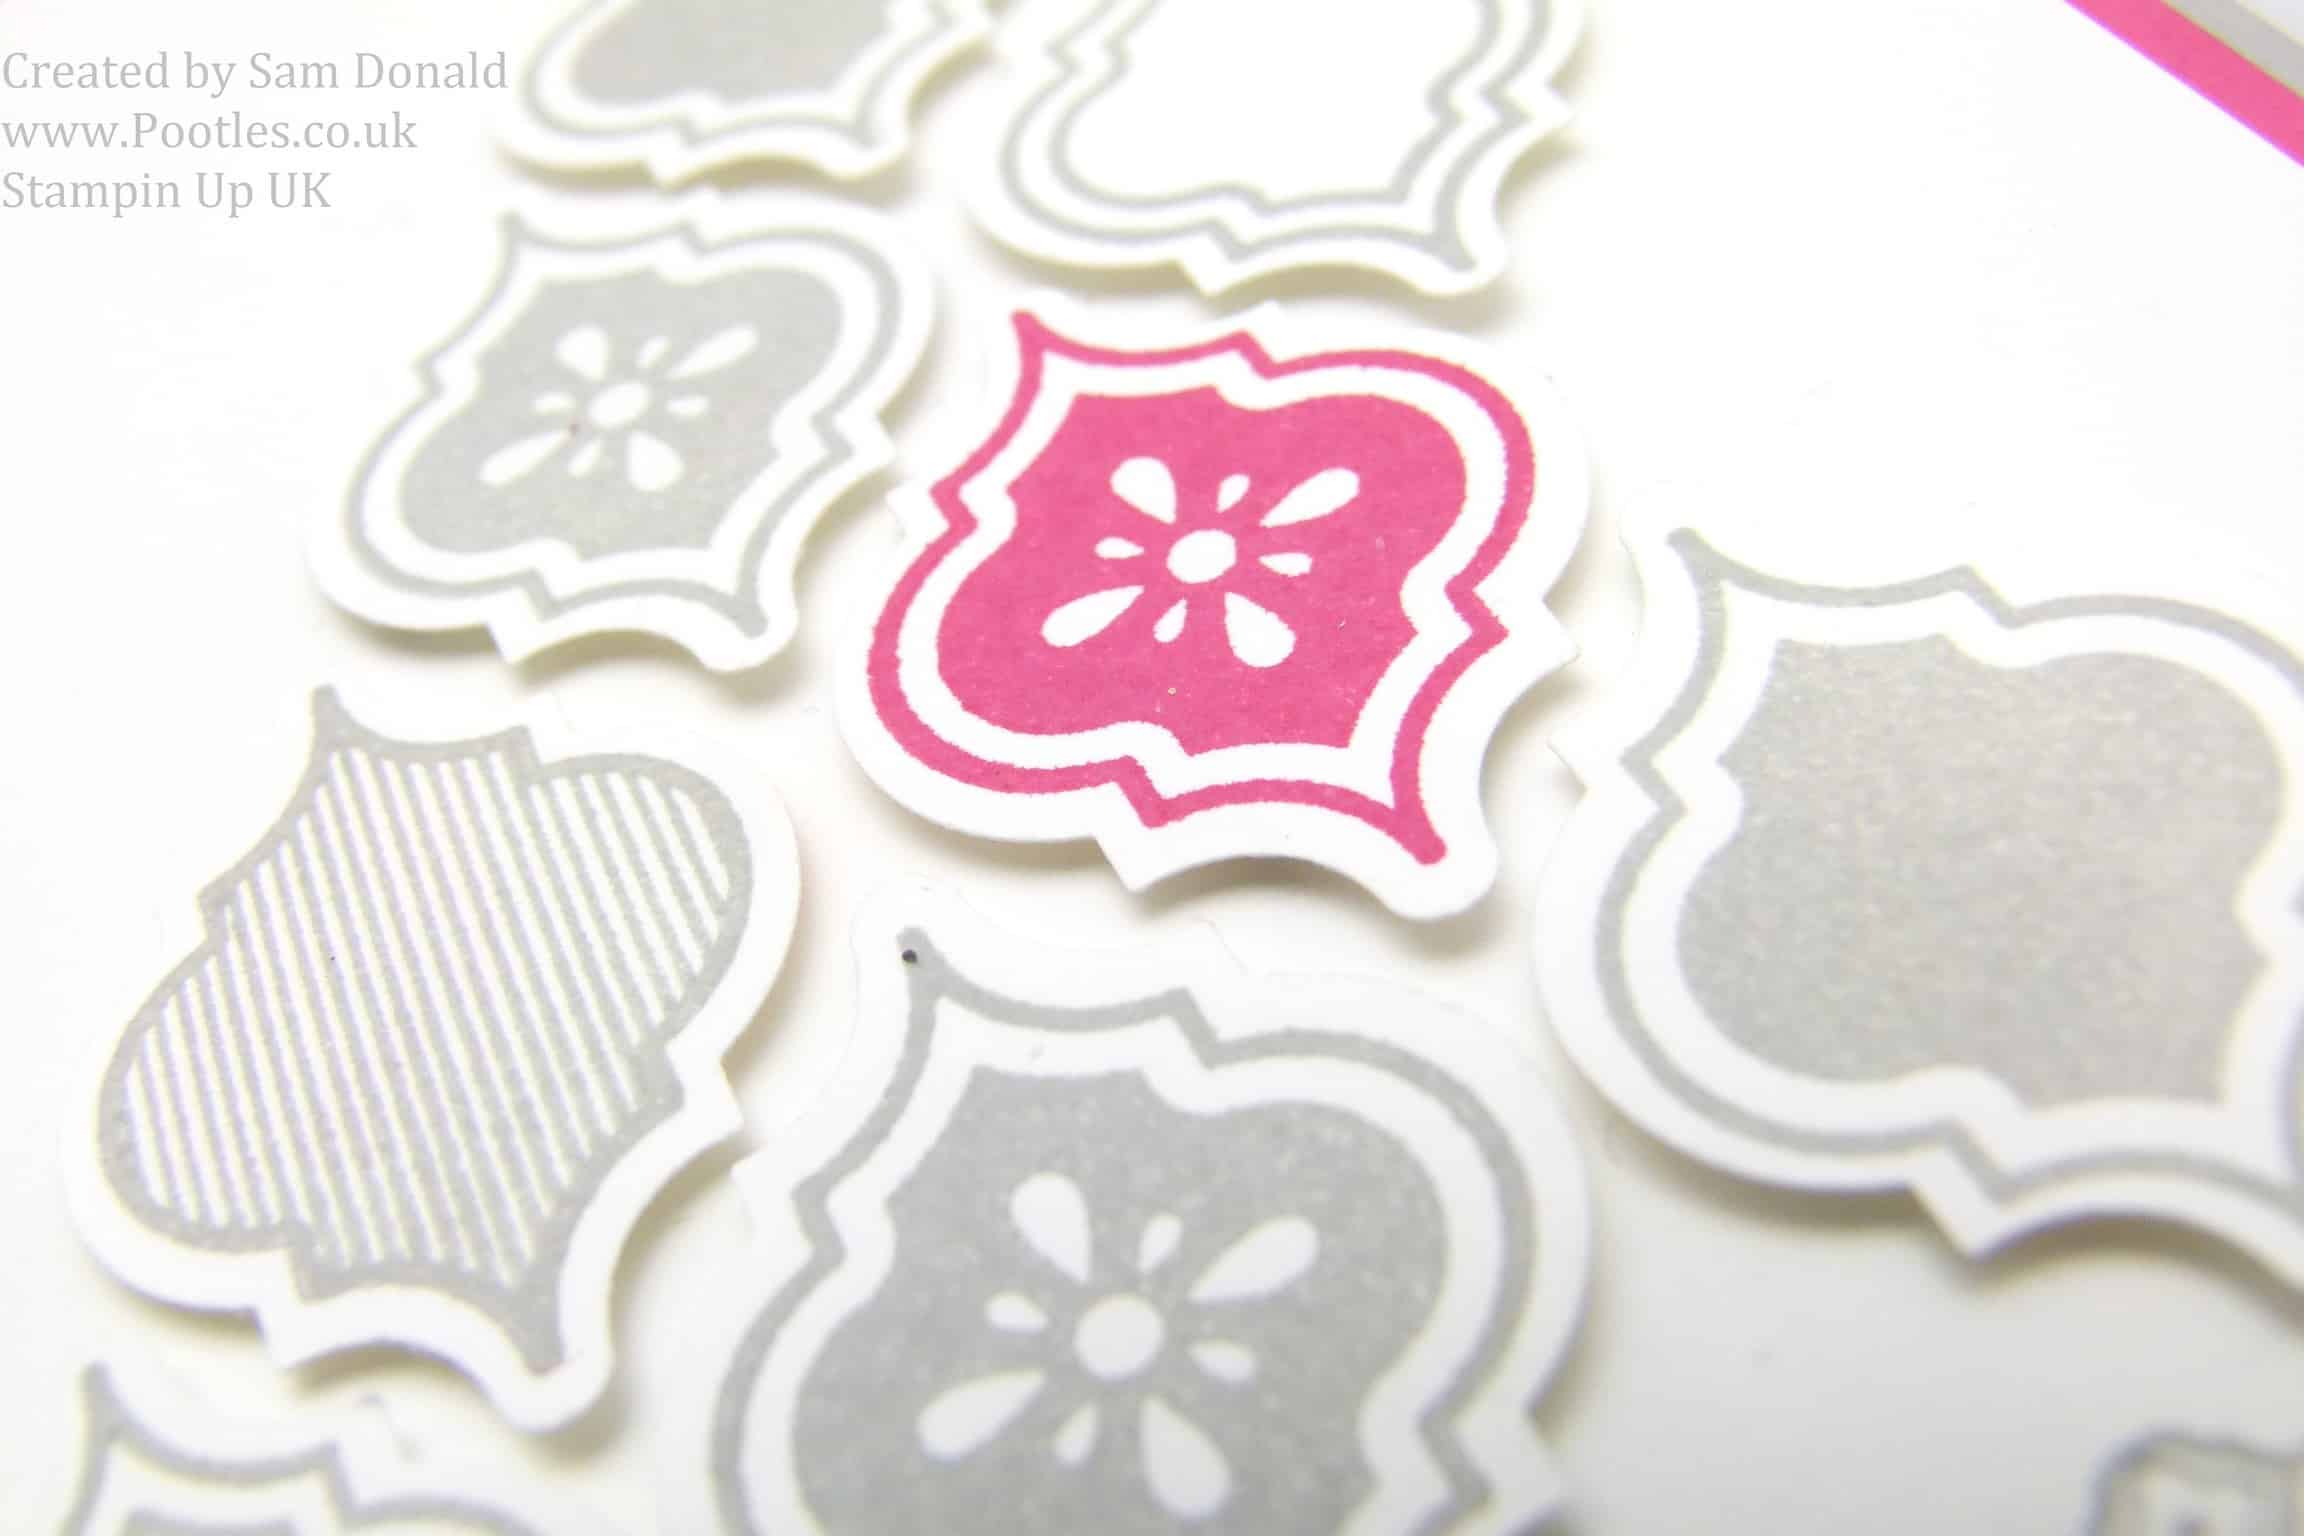 Pootles Stampin Up UK Strawberry Slush Mosaic Madness 2